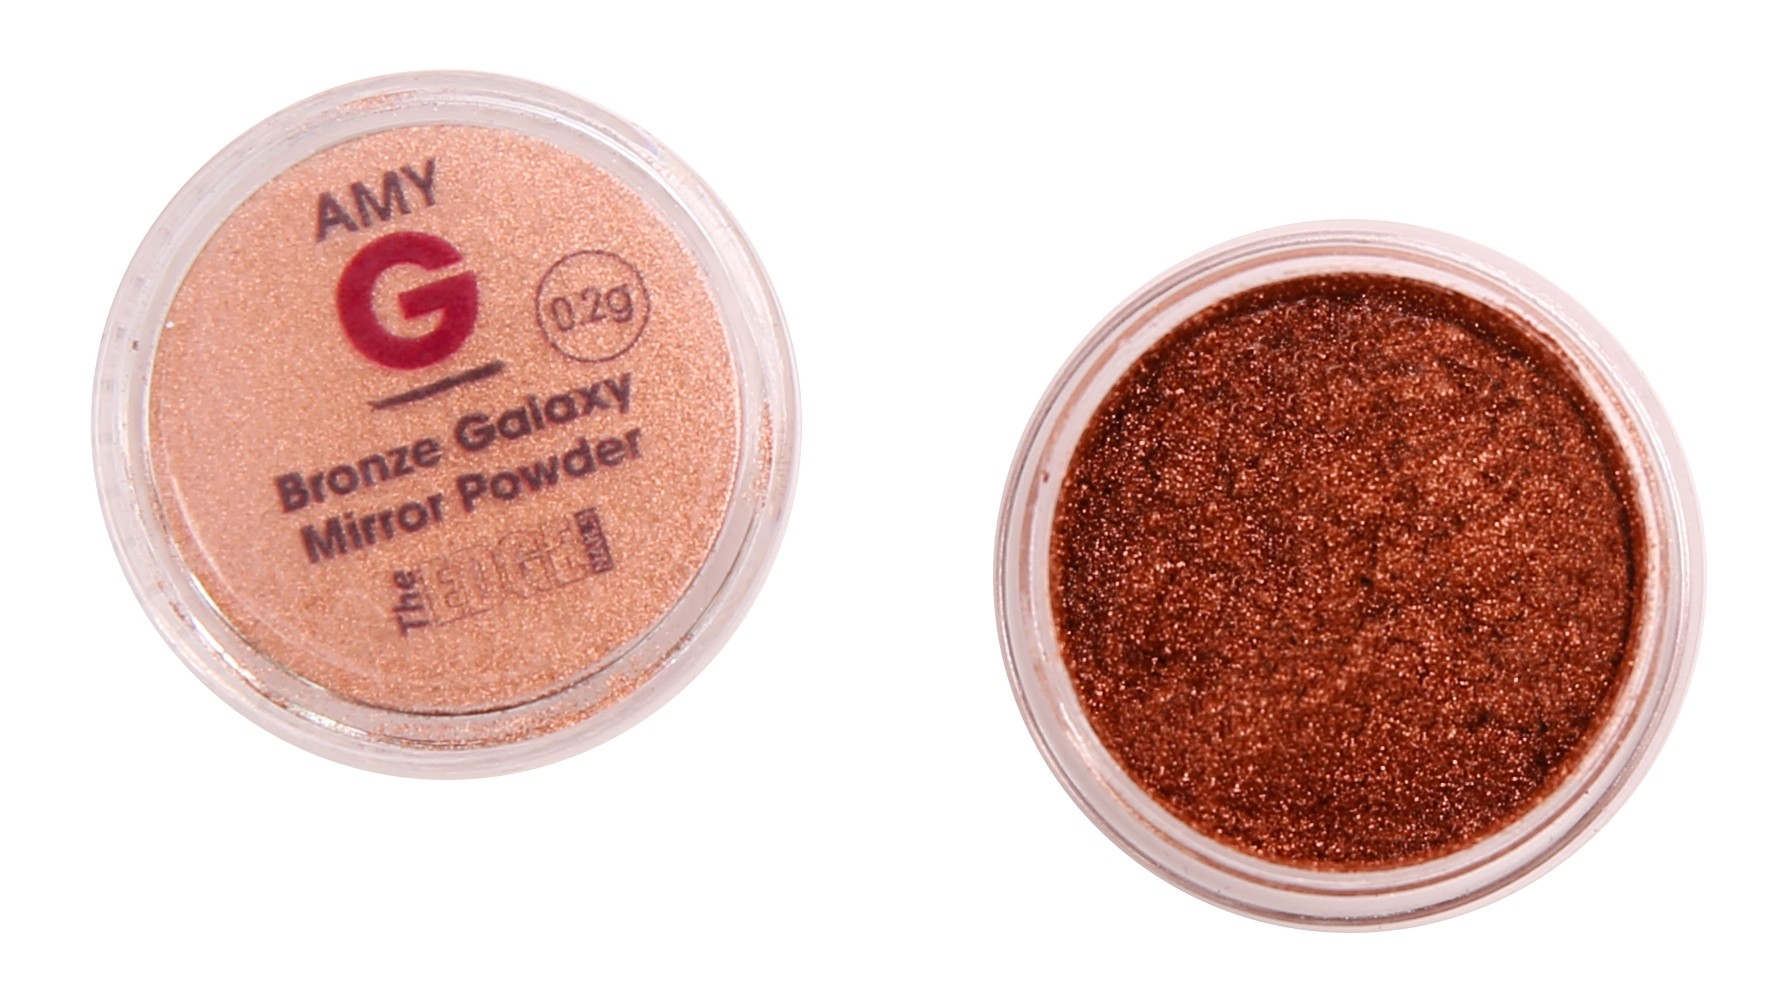 30_03_094_-_bronze_galaxy_mirror_powder_lid_off